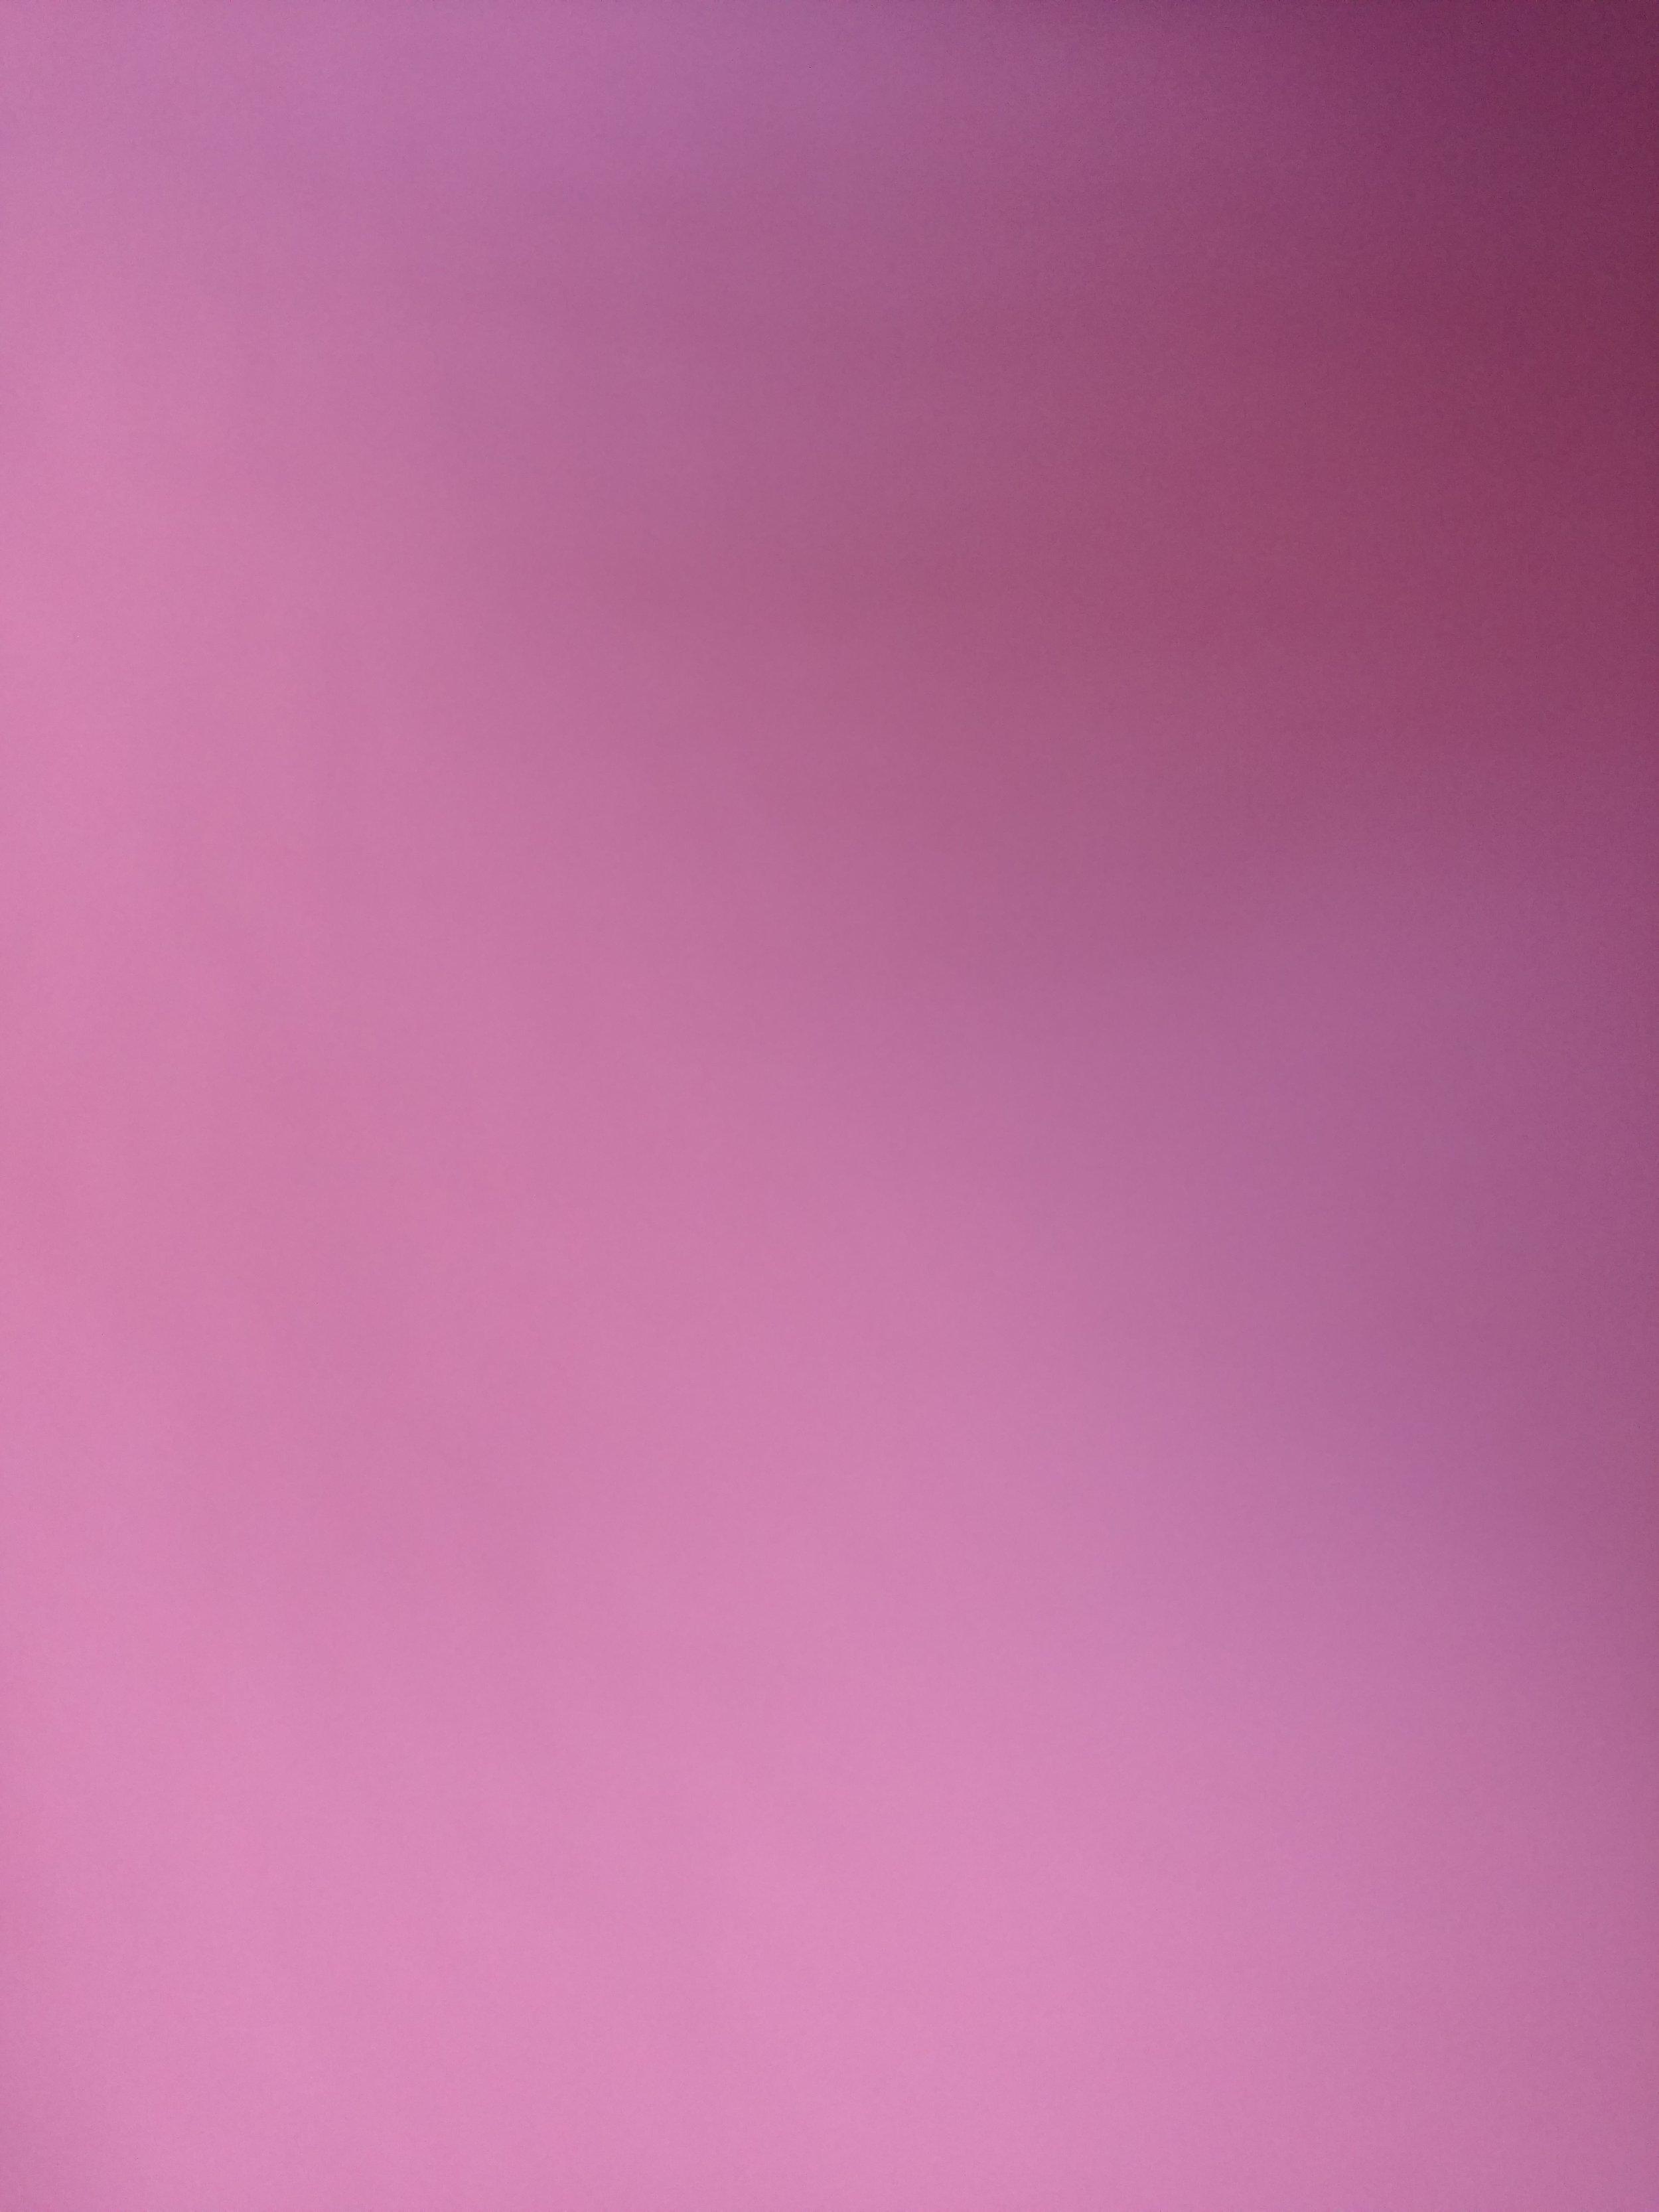 willroth-co-free-texture-gradient-098.jpg